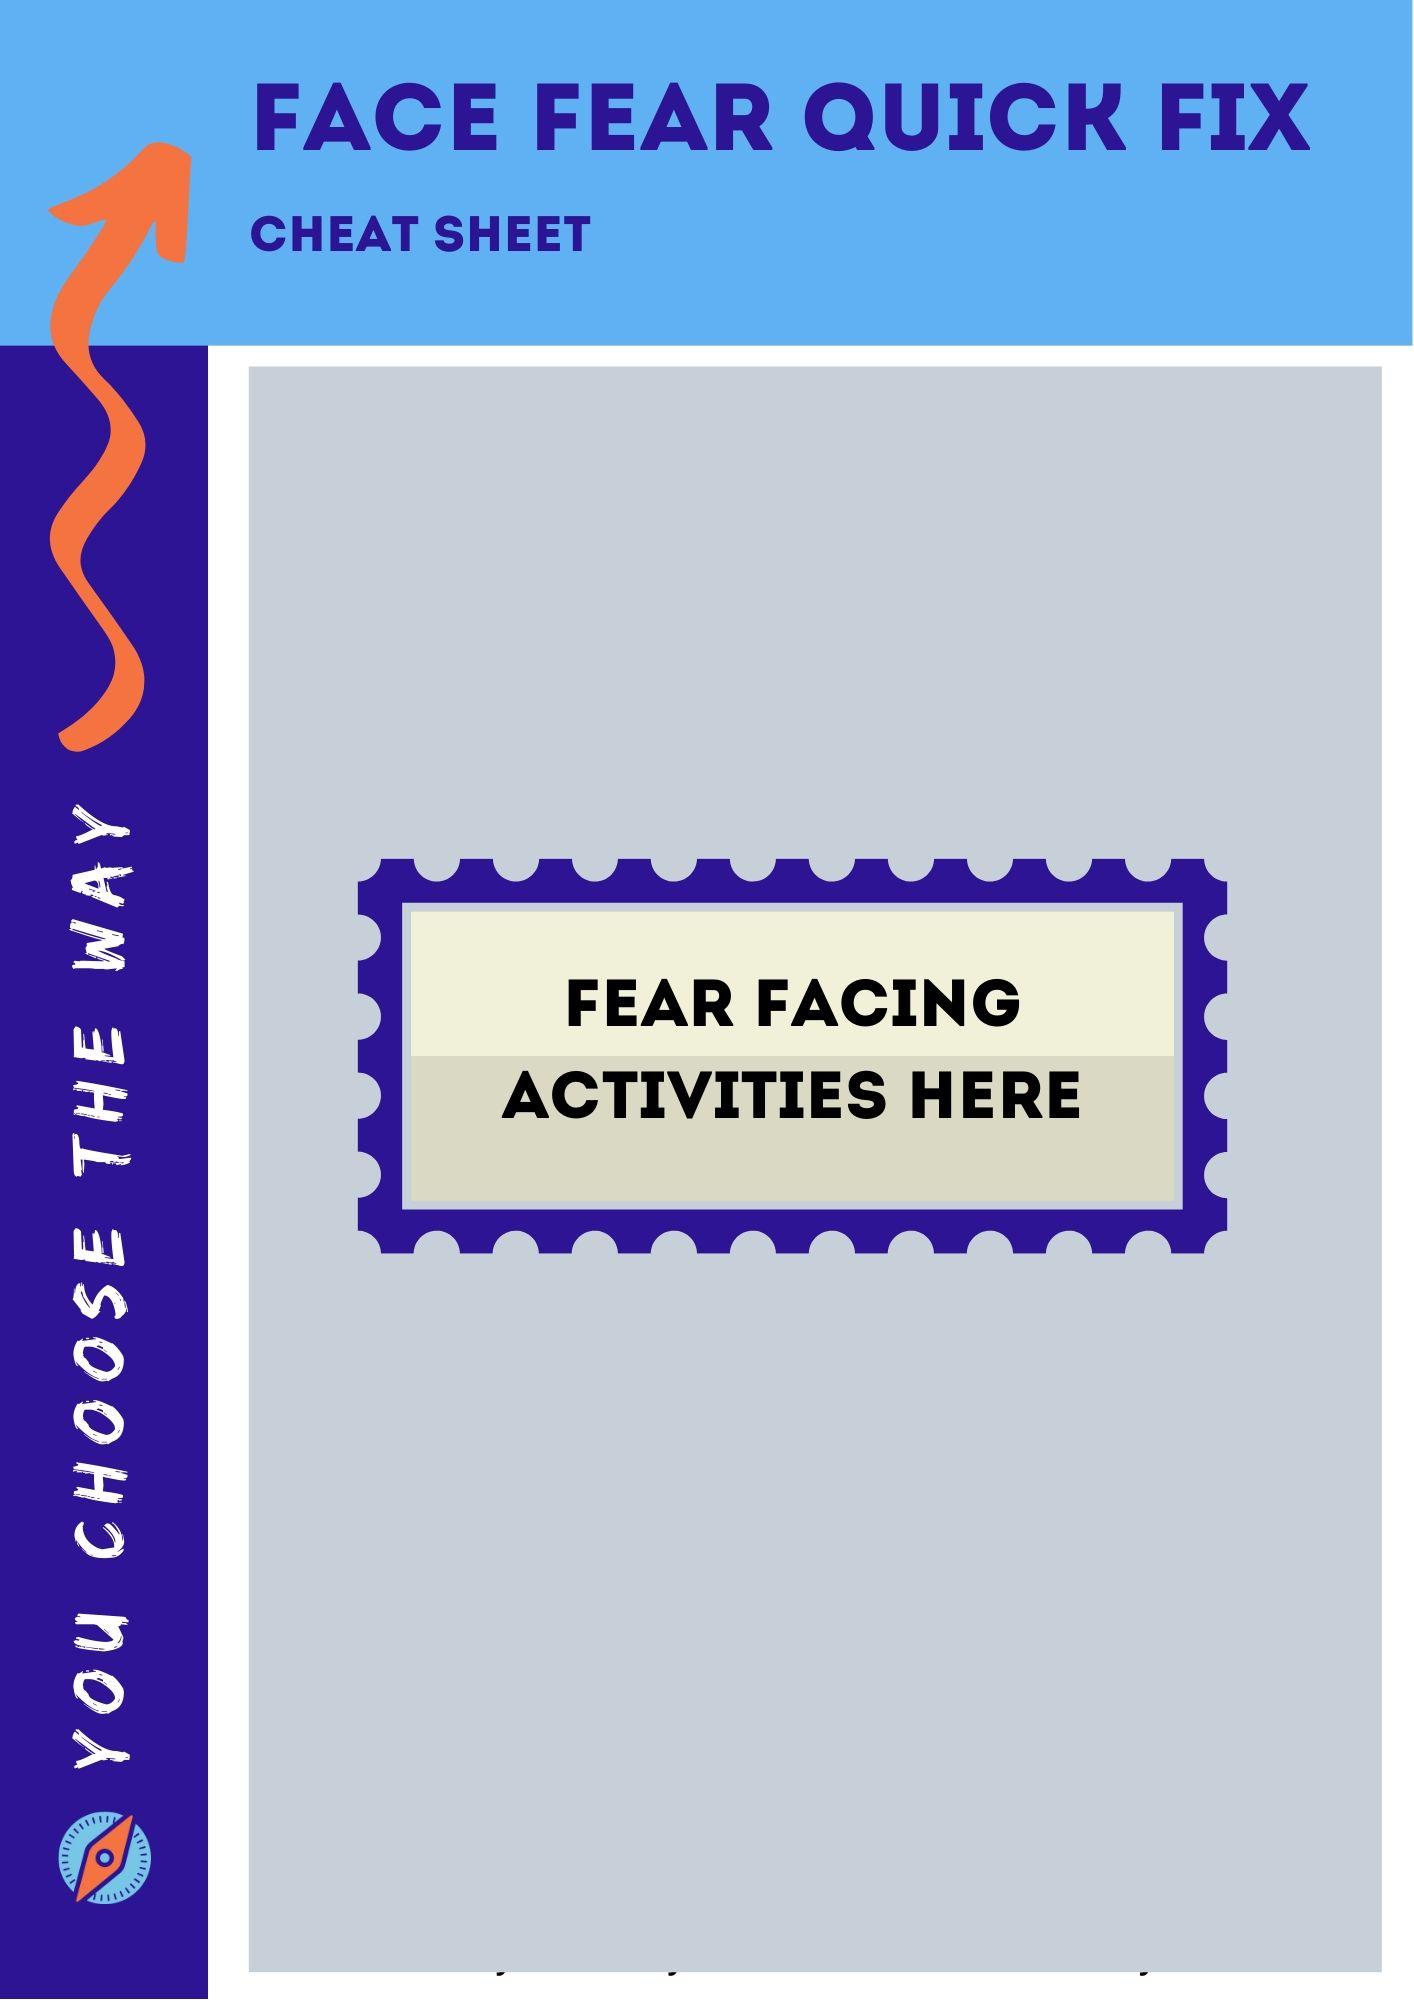 Face Fears Newsletter